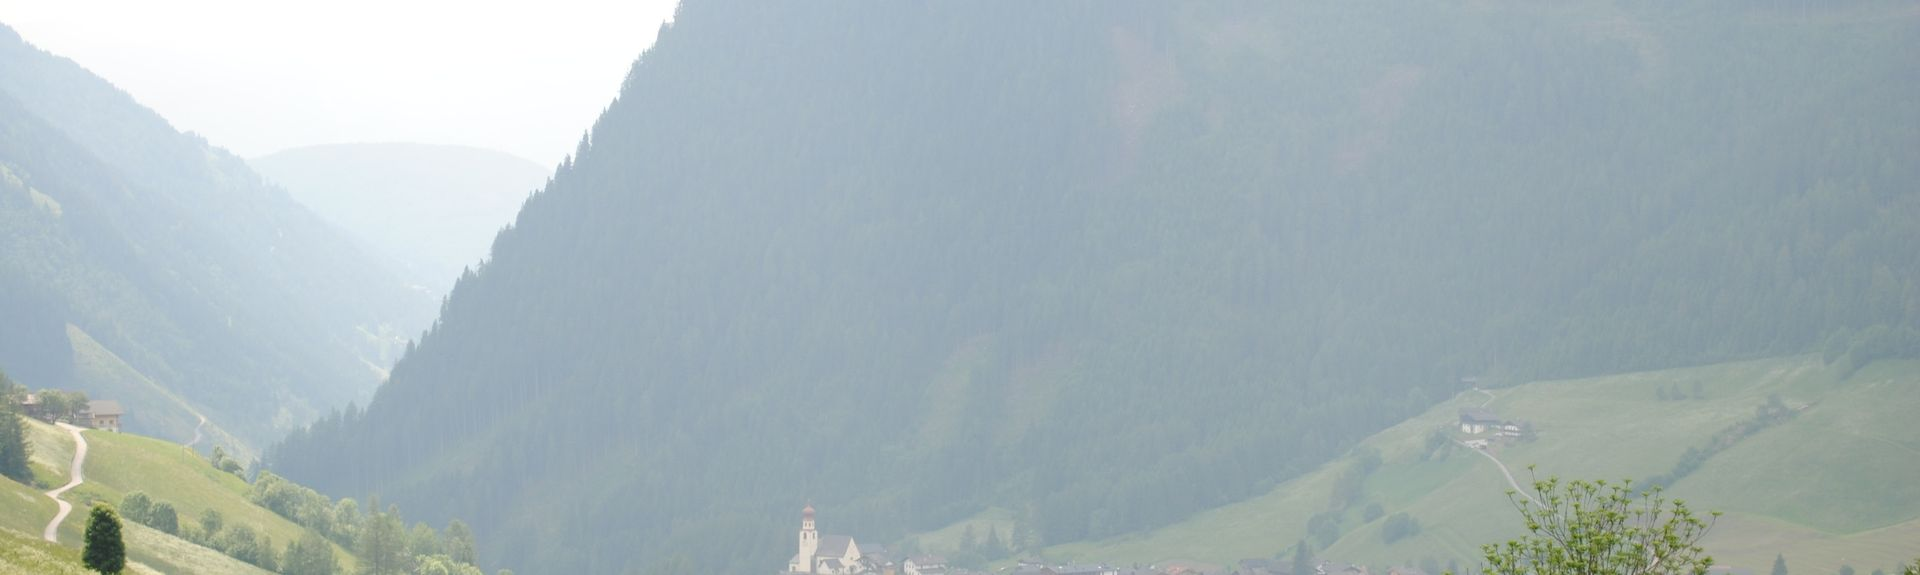 Ahrntal, Trentino-Südtirol, Italien